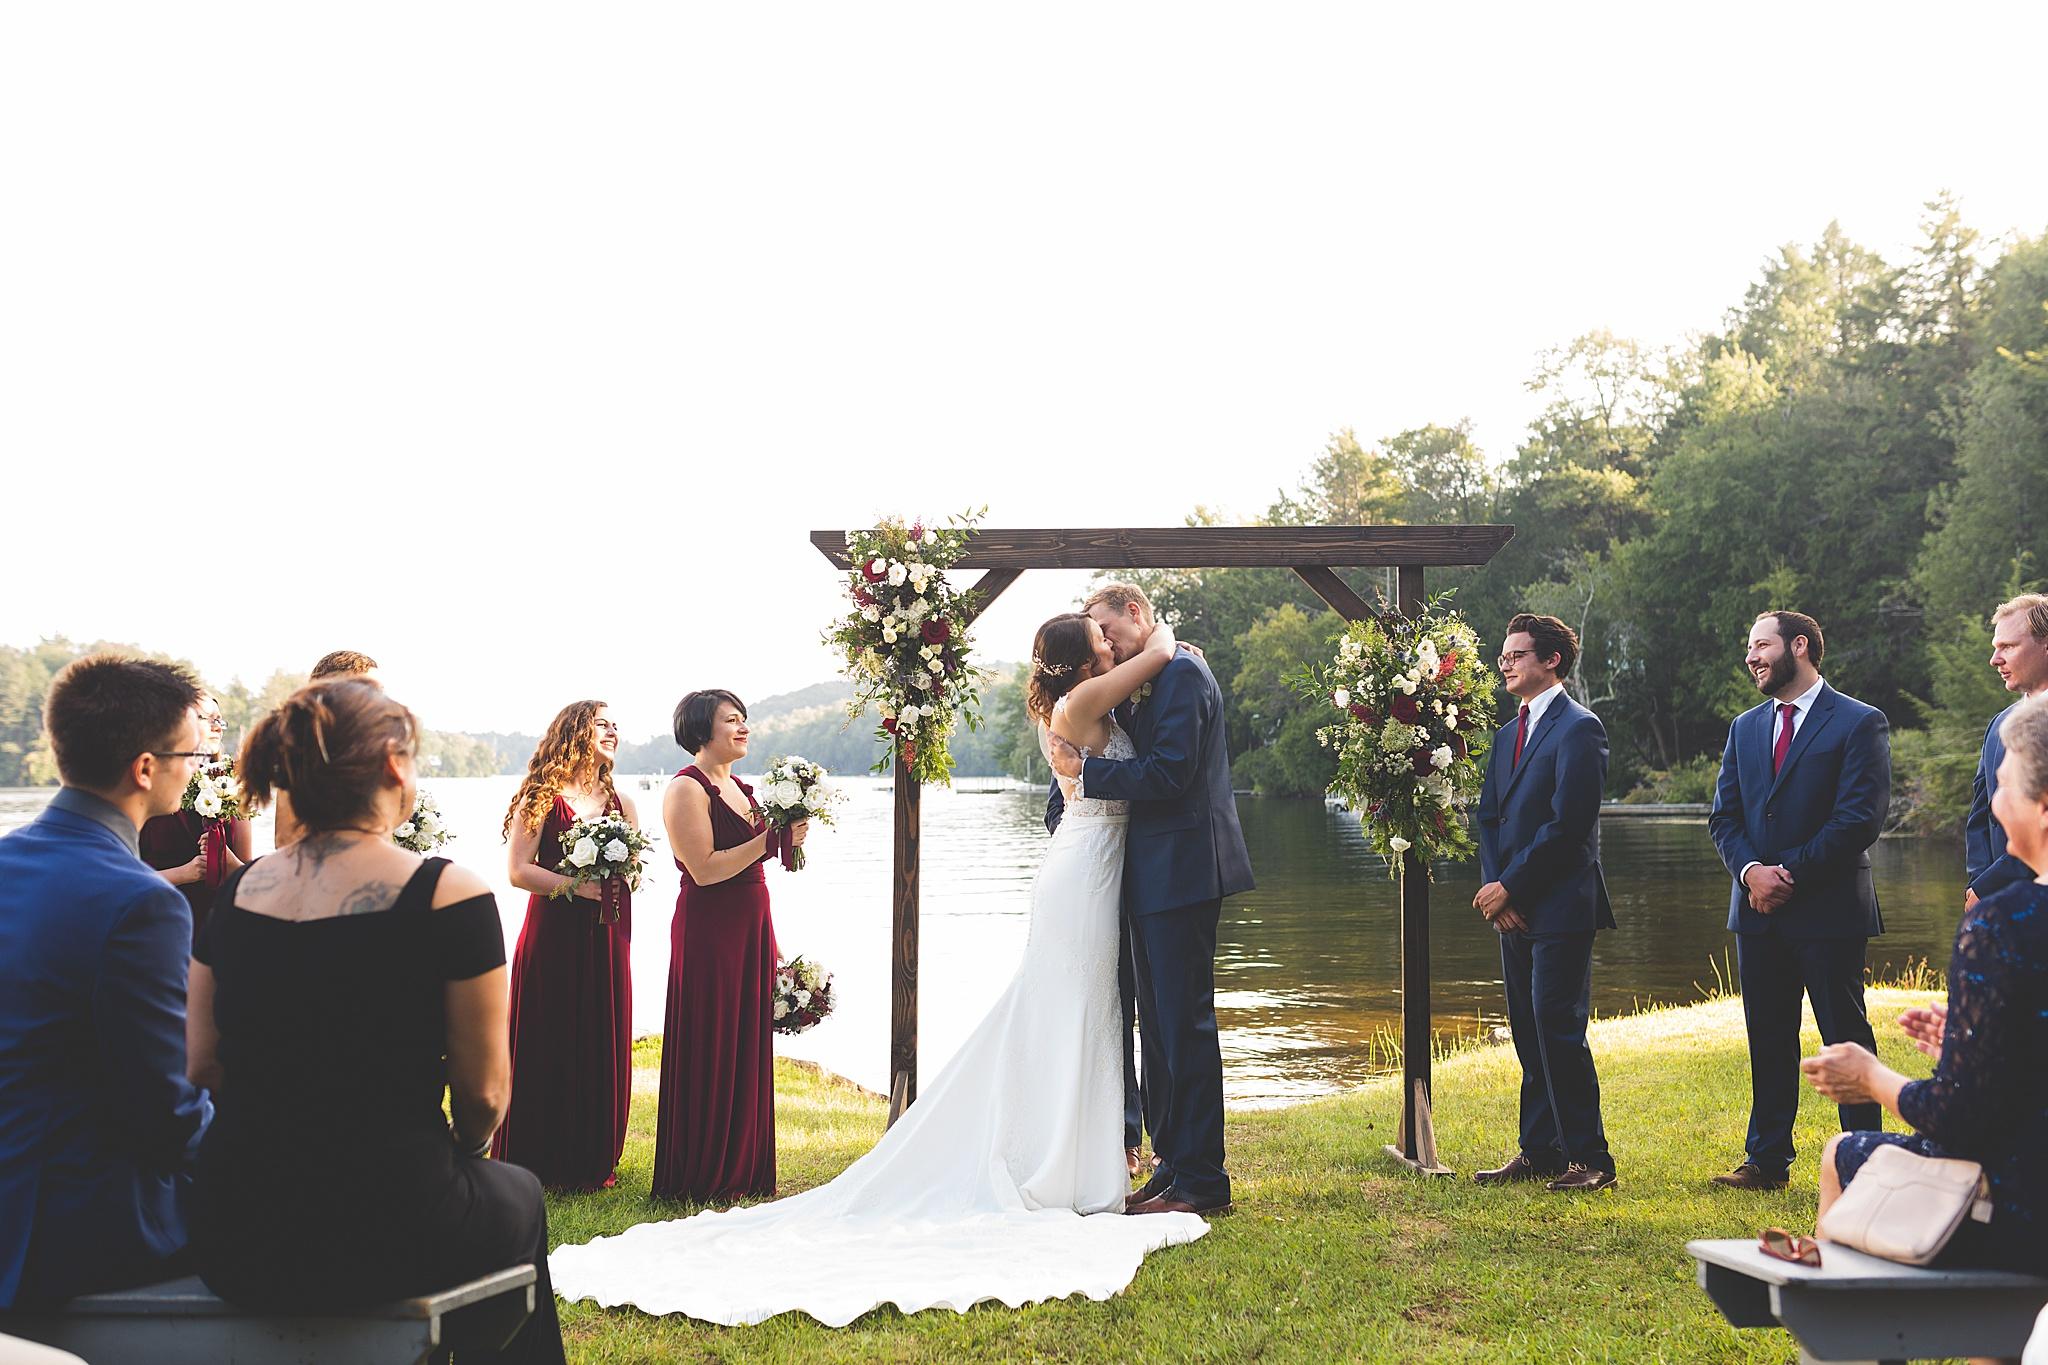 Albany_Wedding_Photographer_7524.jpg